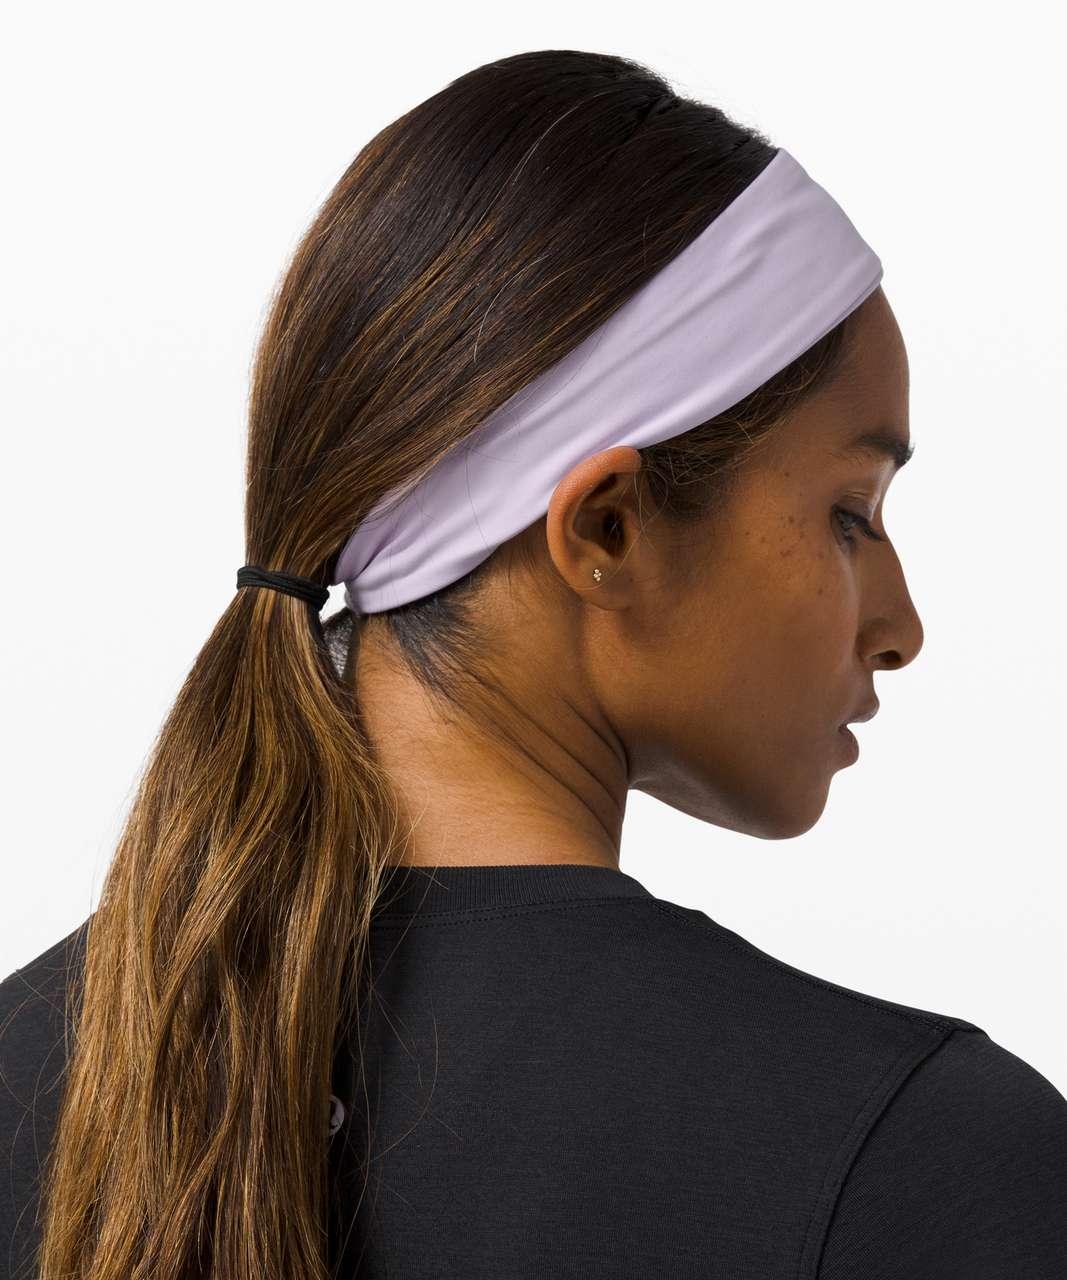 Lululemon Fly Away Tamer Headband - Lavender Dew